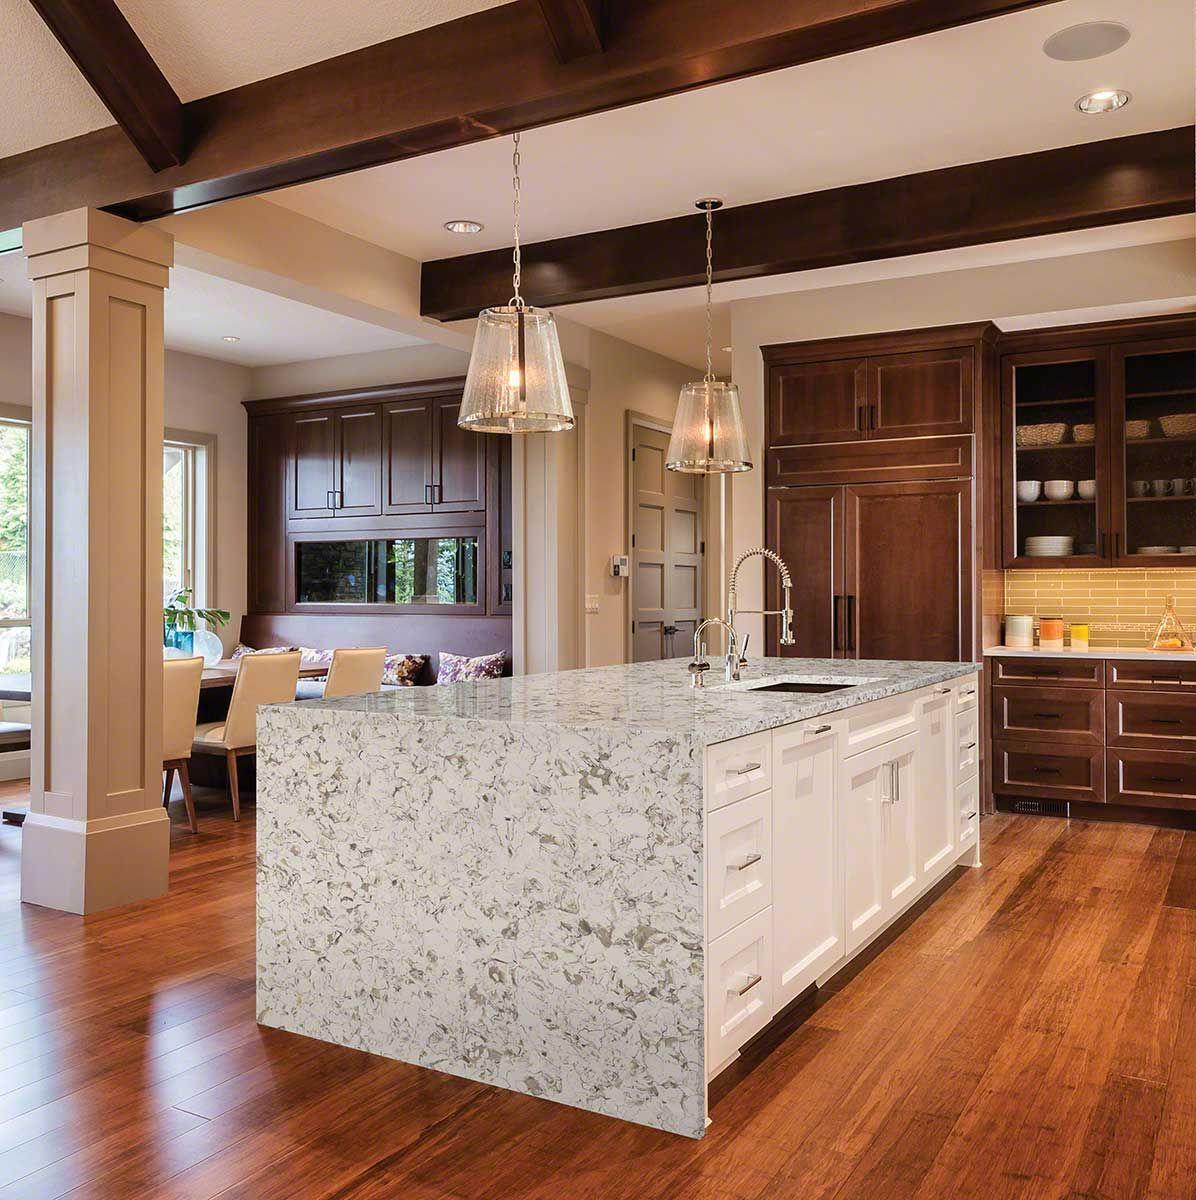 Montclair White Quartz Www Graniteworksmd Com Clean Quartz Countertops White Quartz Countertop Quartz Kitchen